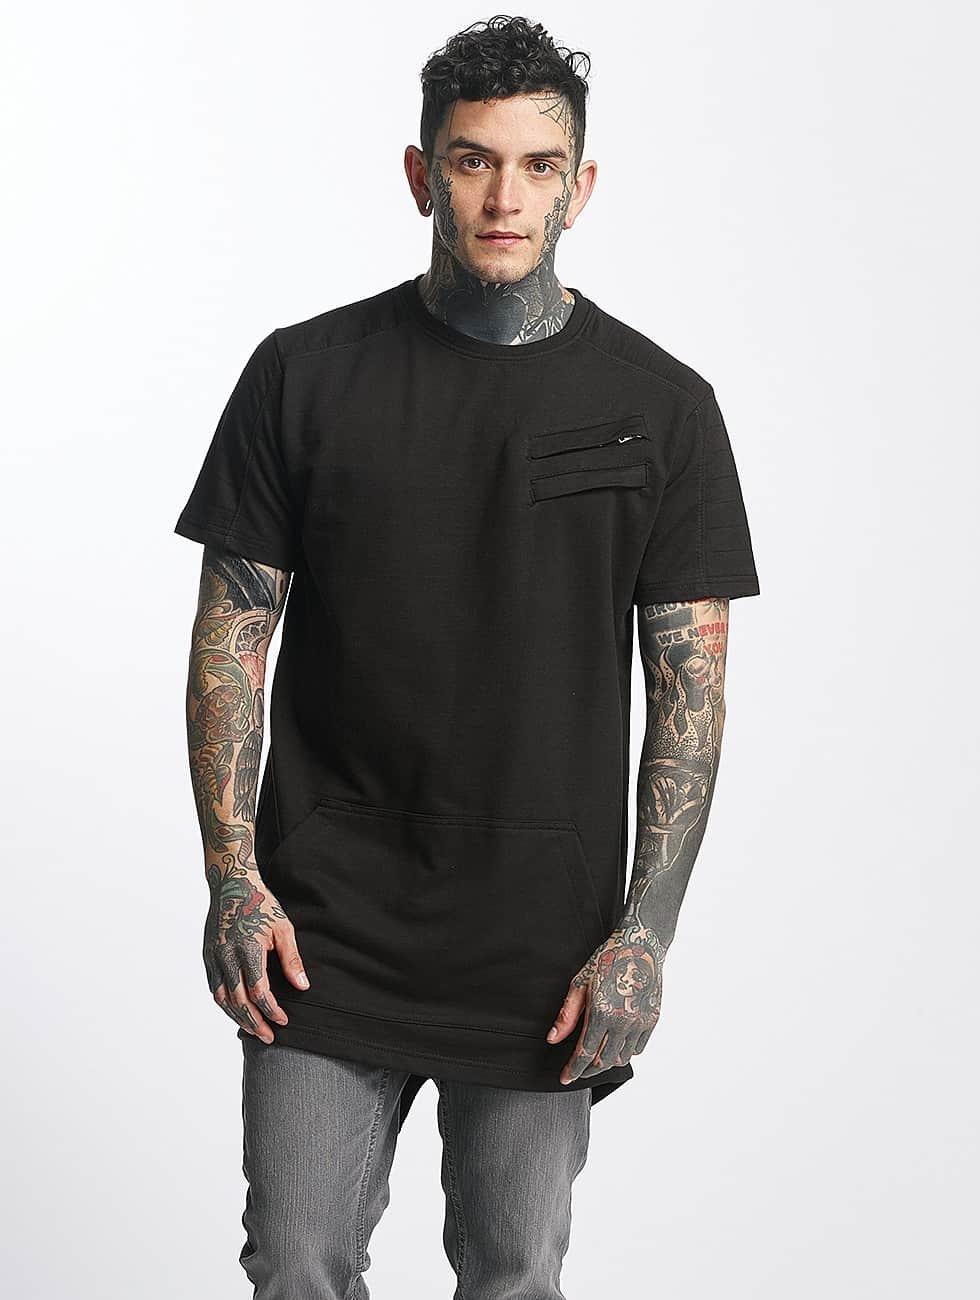 Tuffskull T-Shirt heavy black